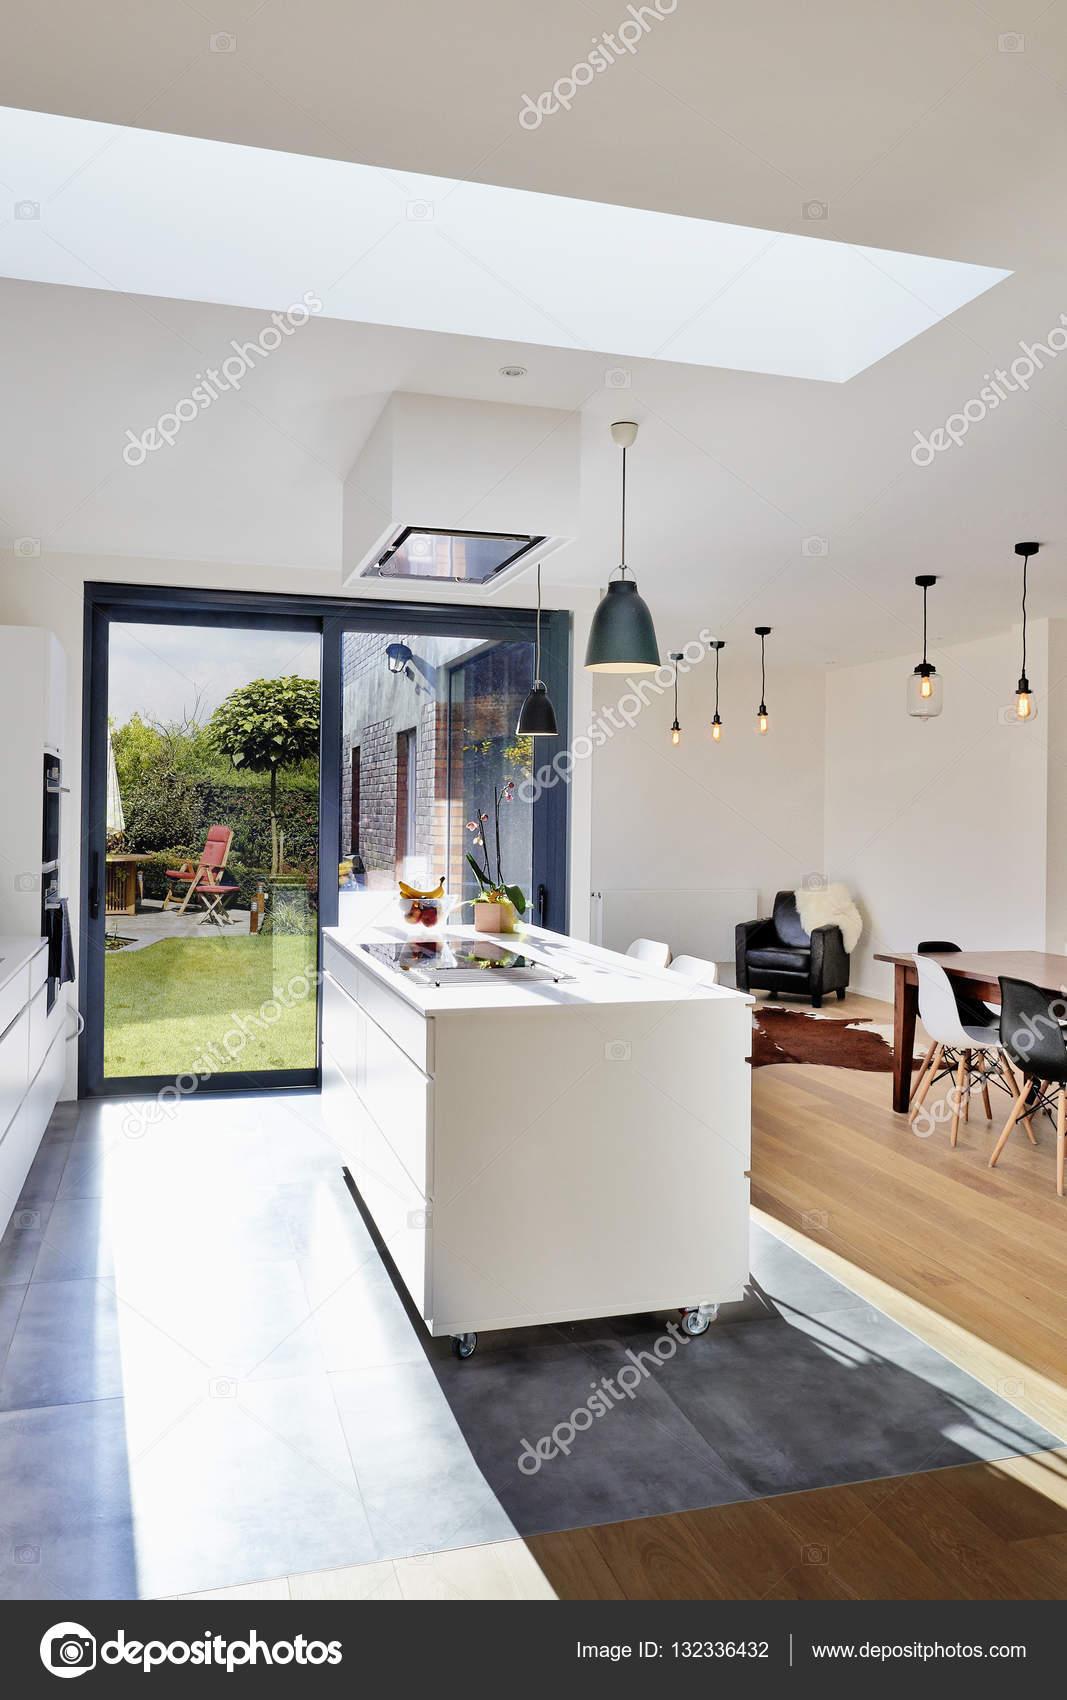 Cucina aperta moderna da loft con vista su un lussureggiante ...